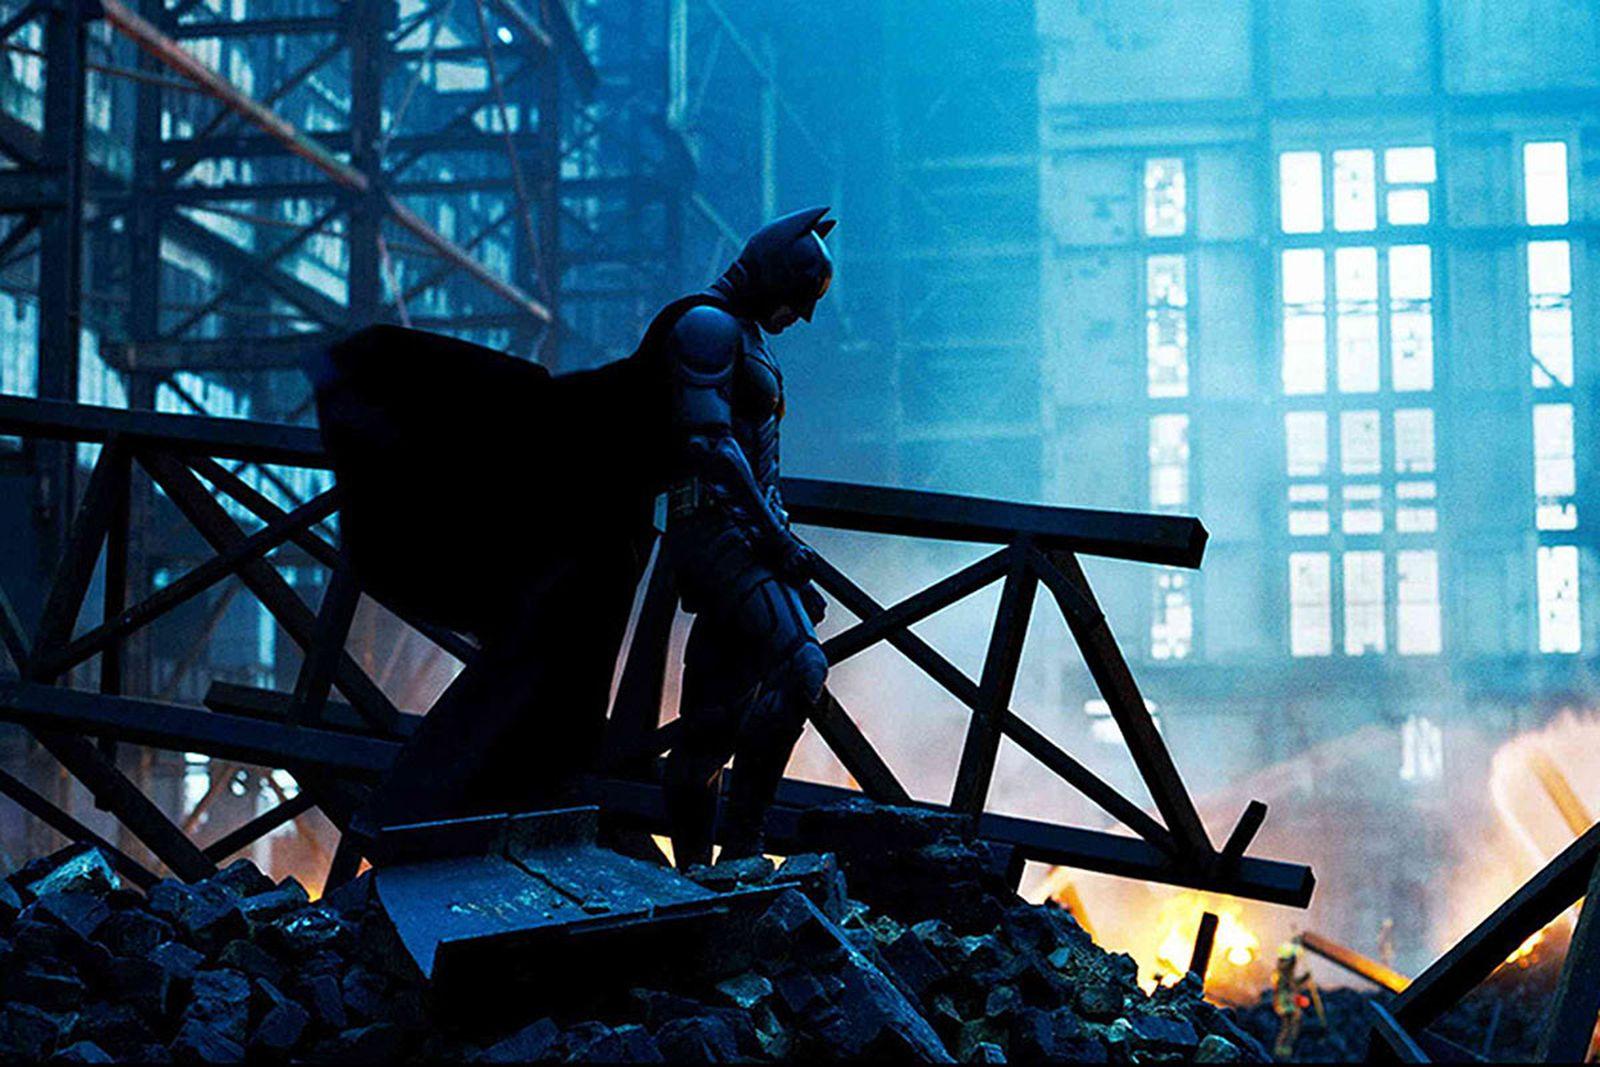 the dark knight imax 10th anniversary Christopher Nolan